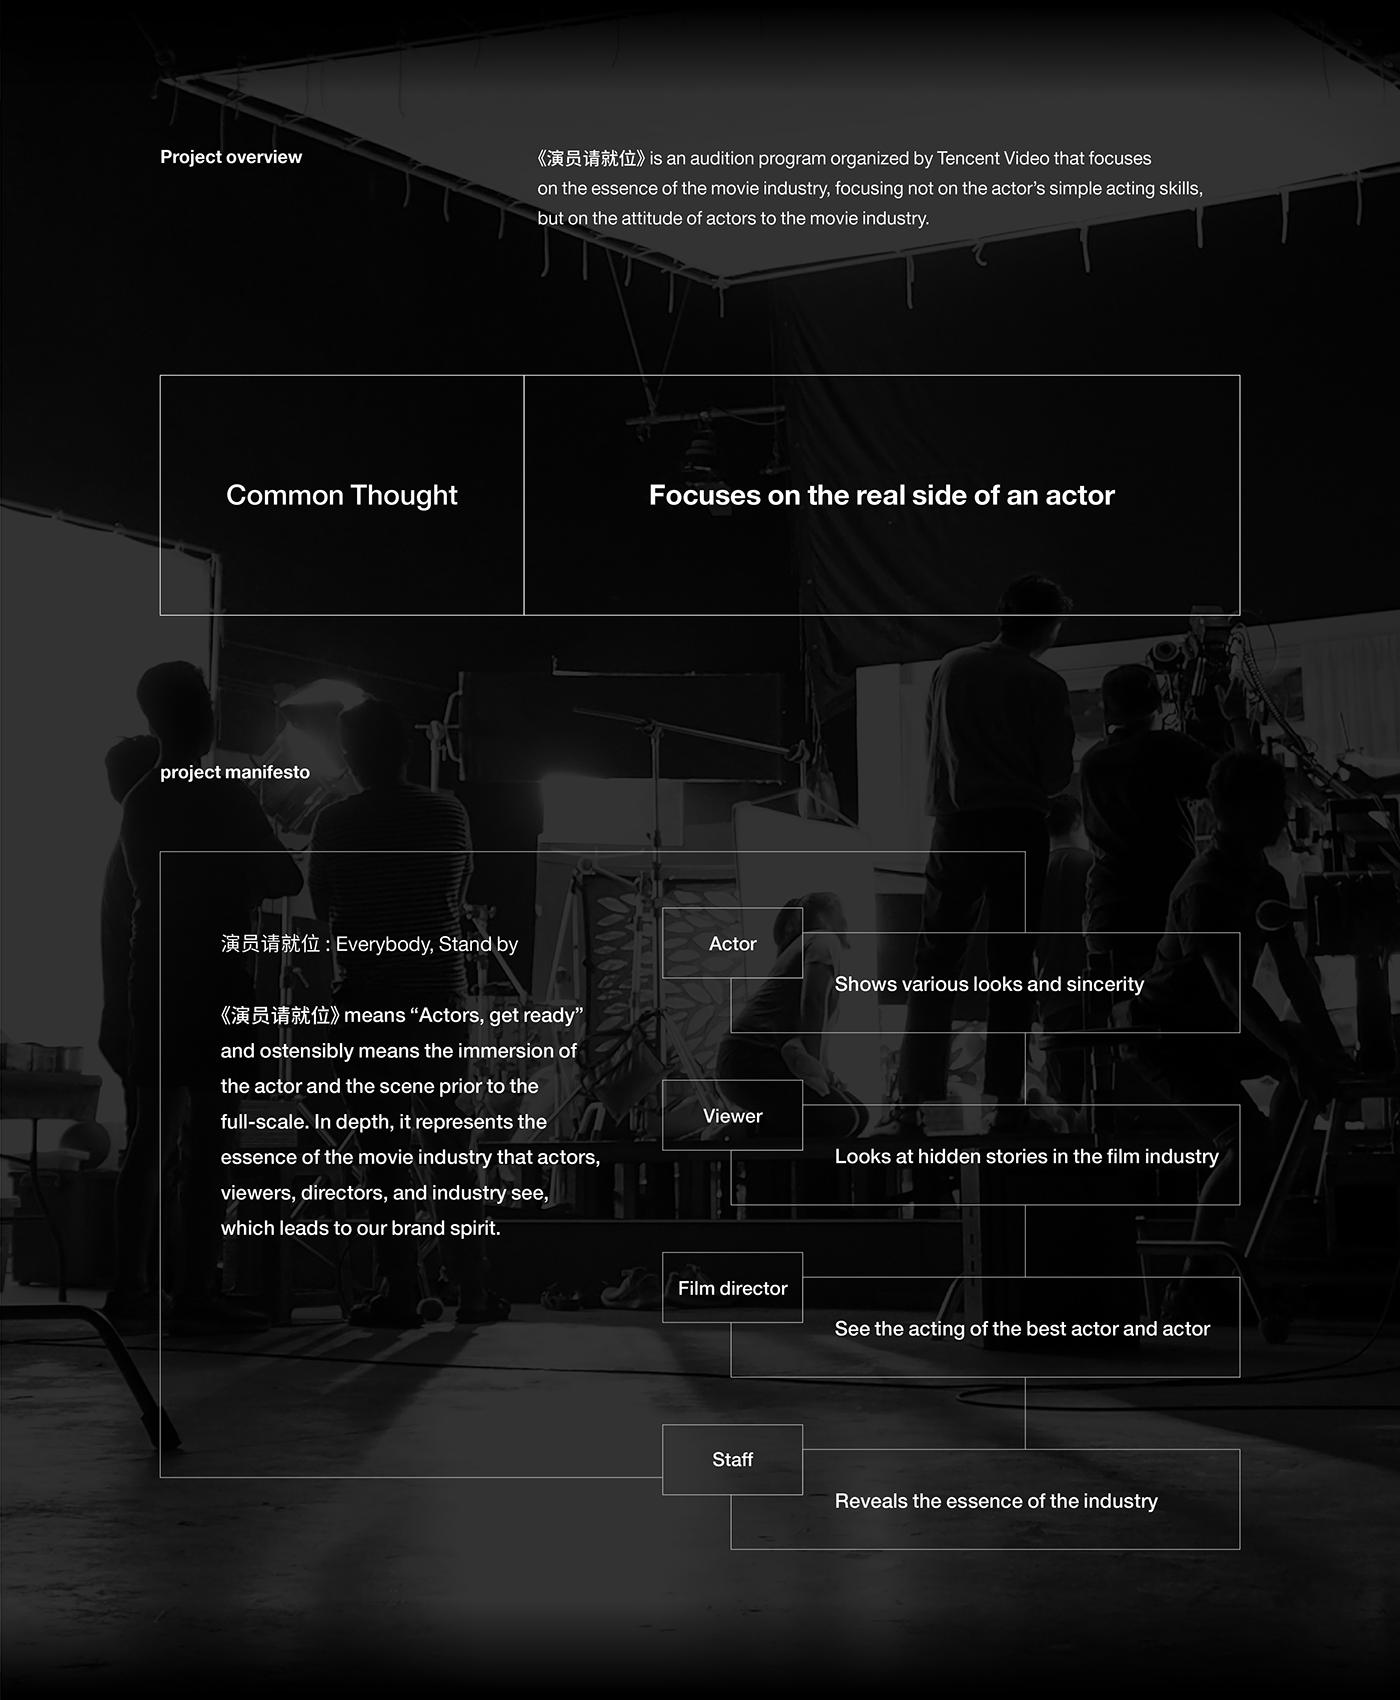 Image may contain: screenshot, indoor and black